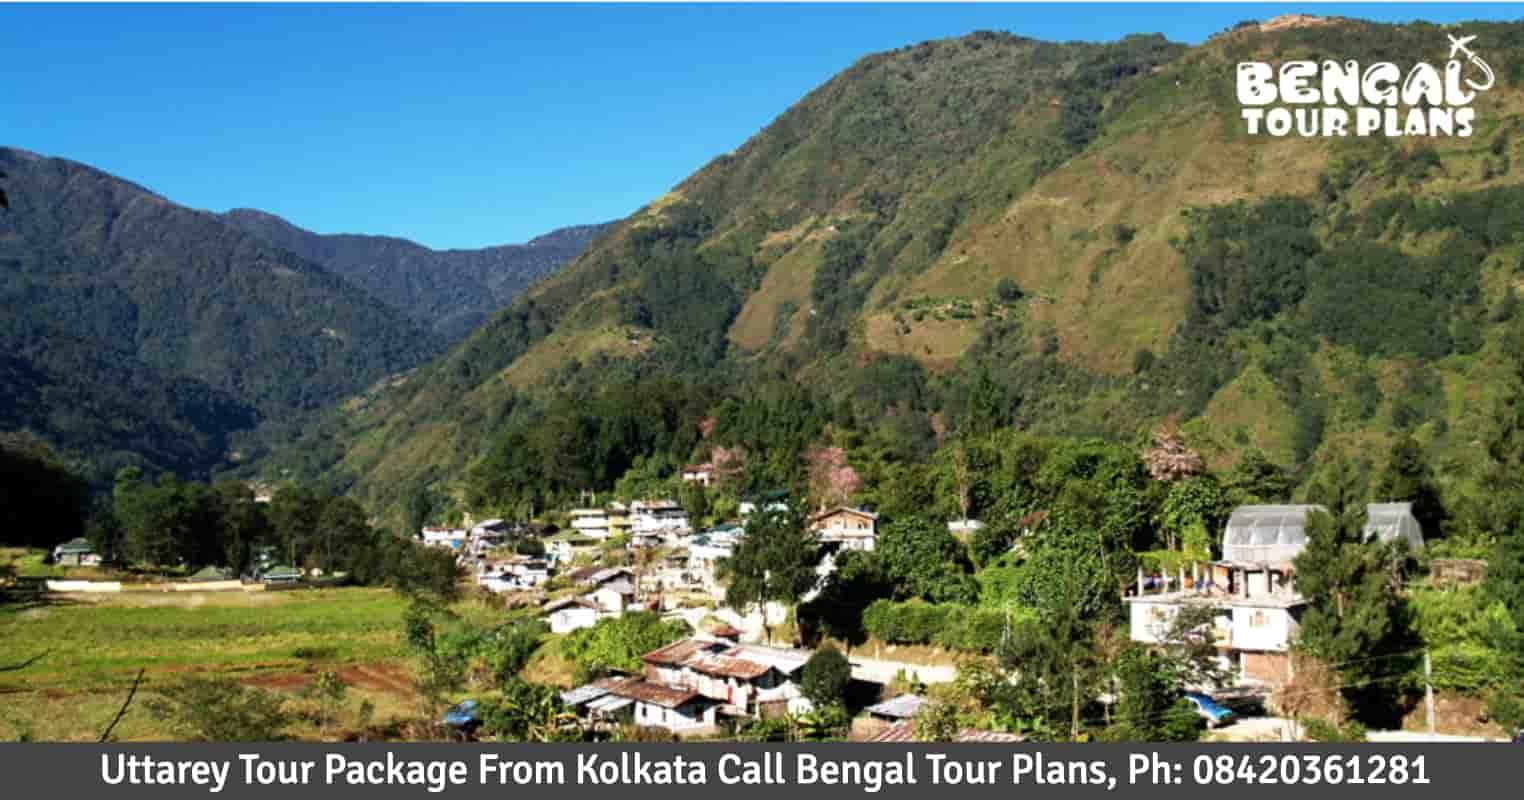 Uttarey Tour From Kolkata